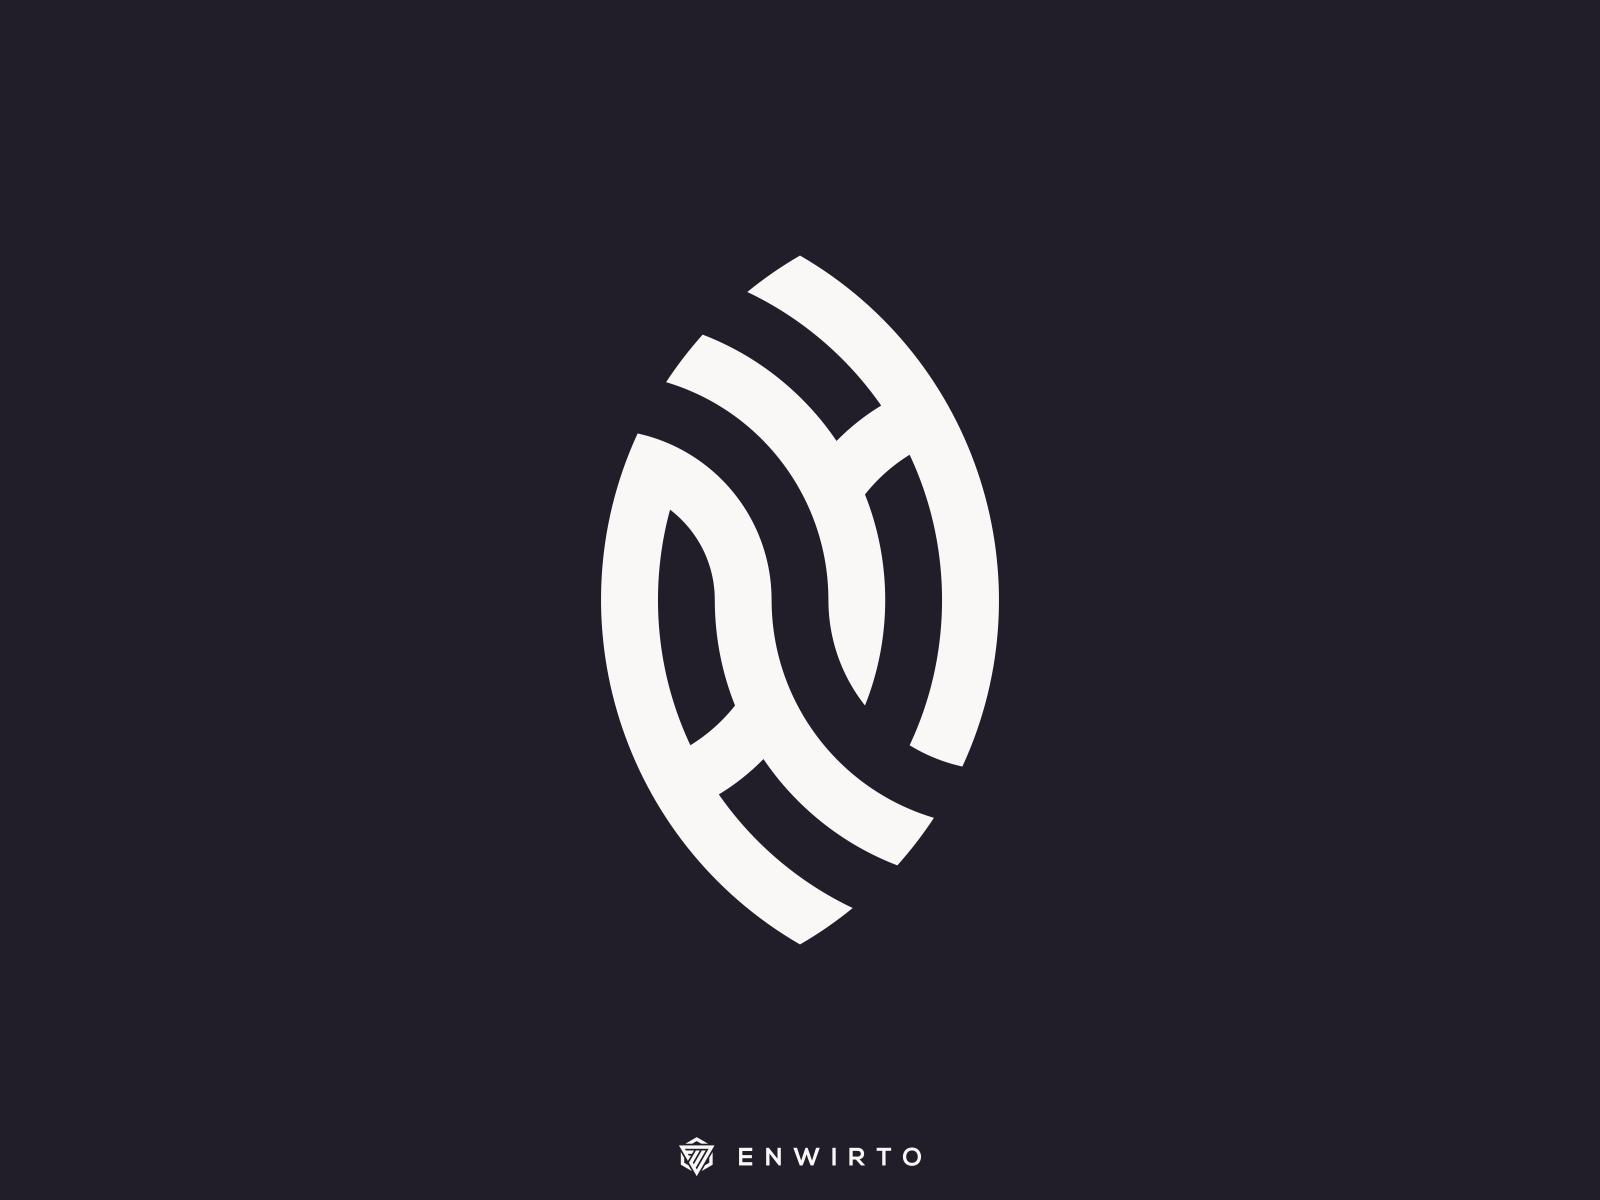 Ah Monogram Logo By Enwirto On Dribbble